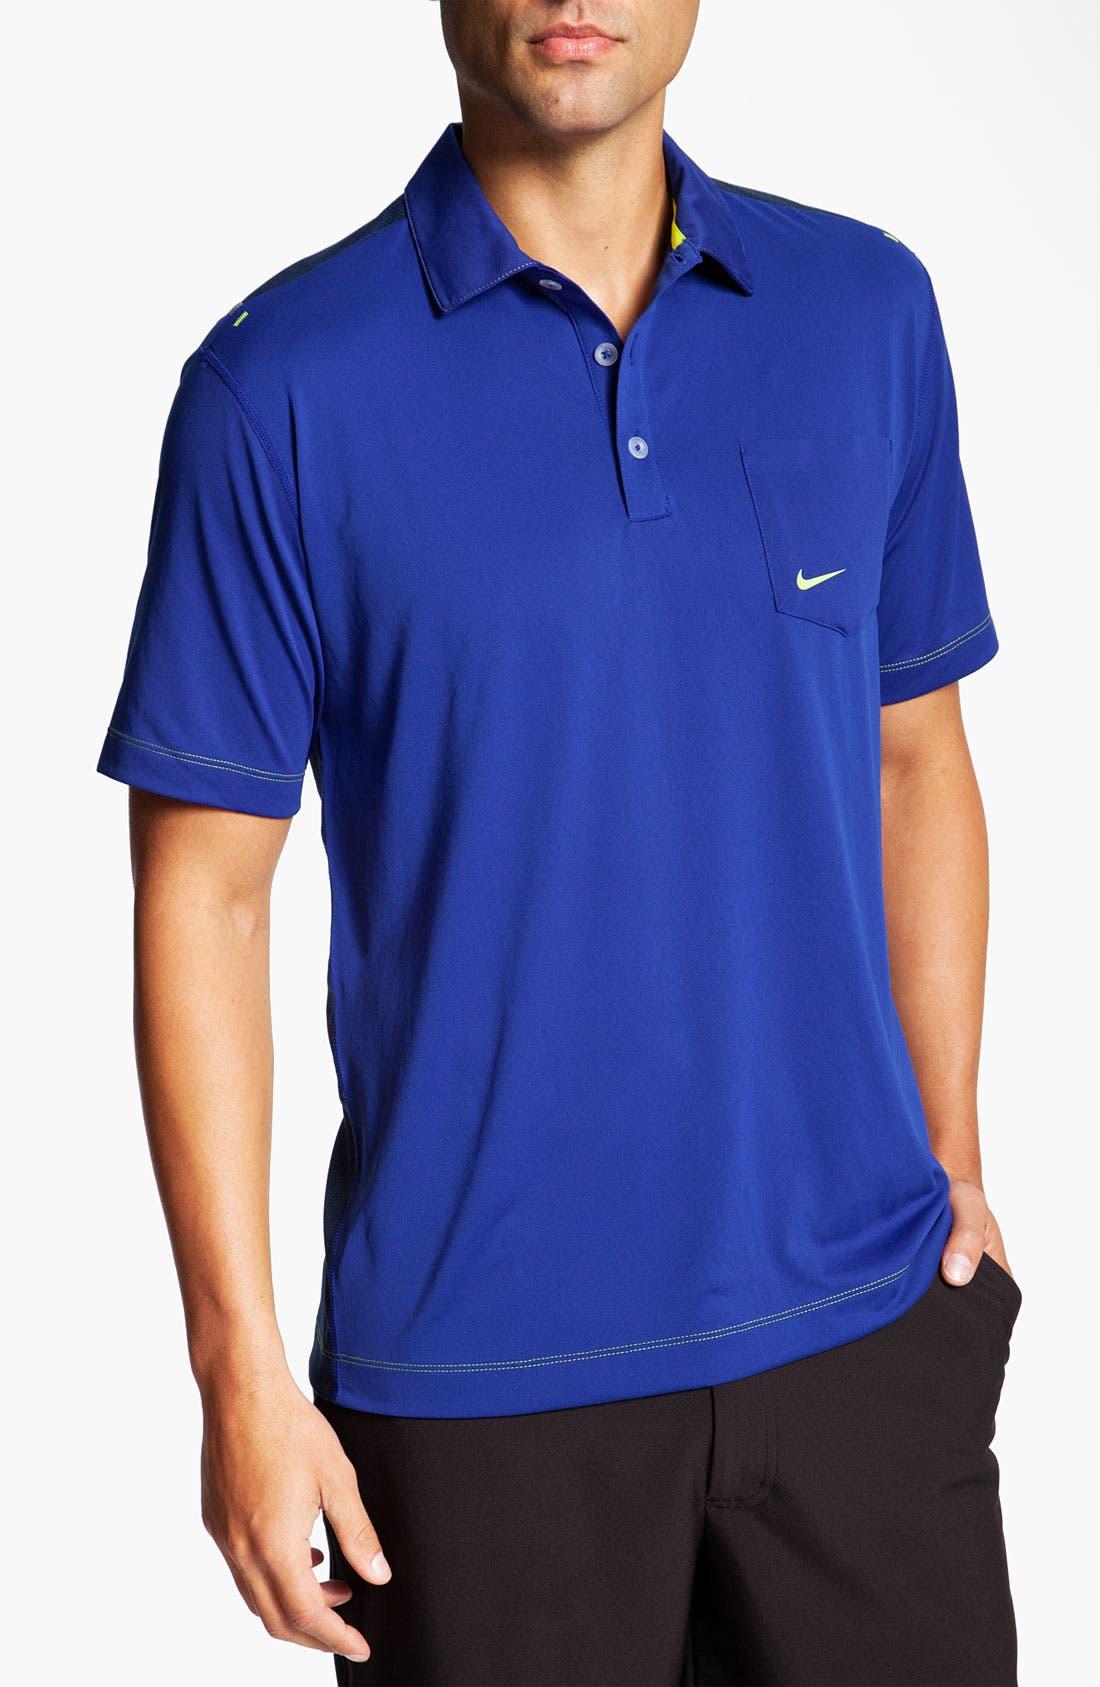 Main Image - Nike Golf 'Body Mapping' Dri-FIT Polo